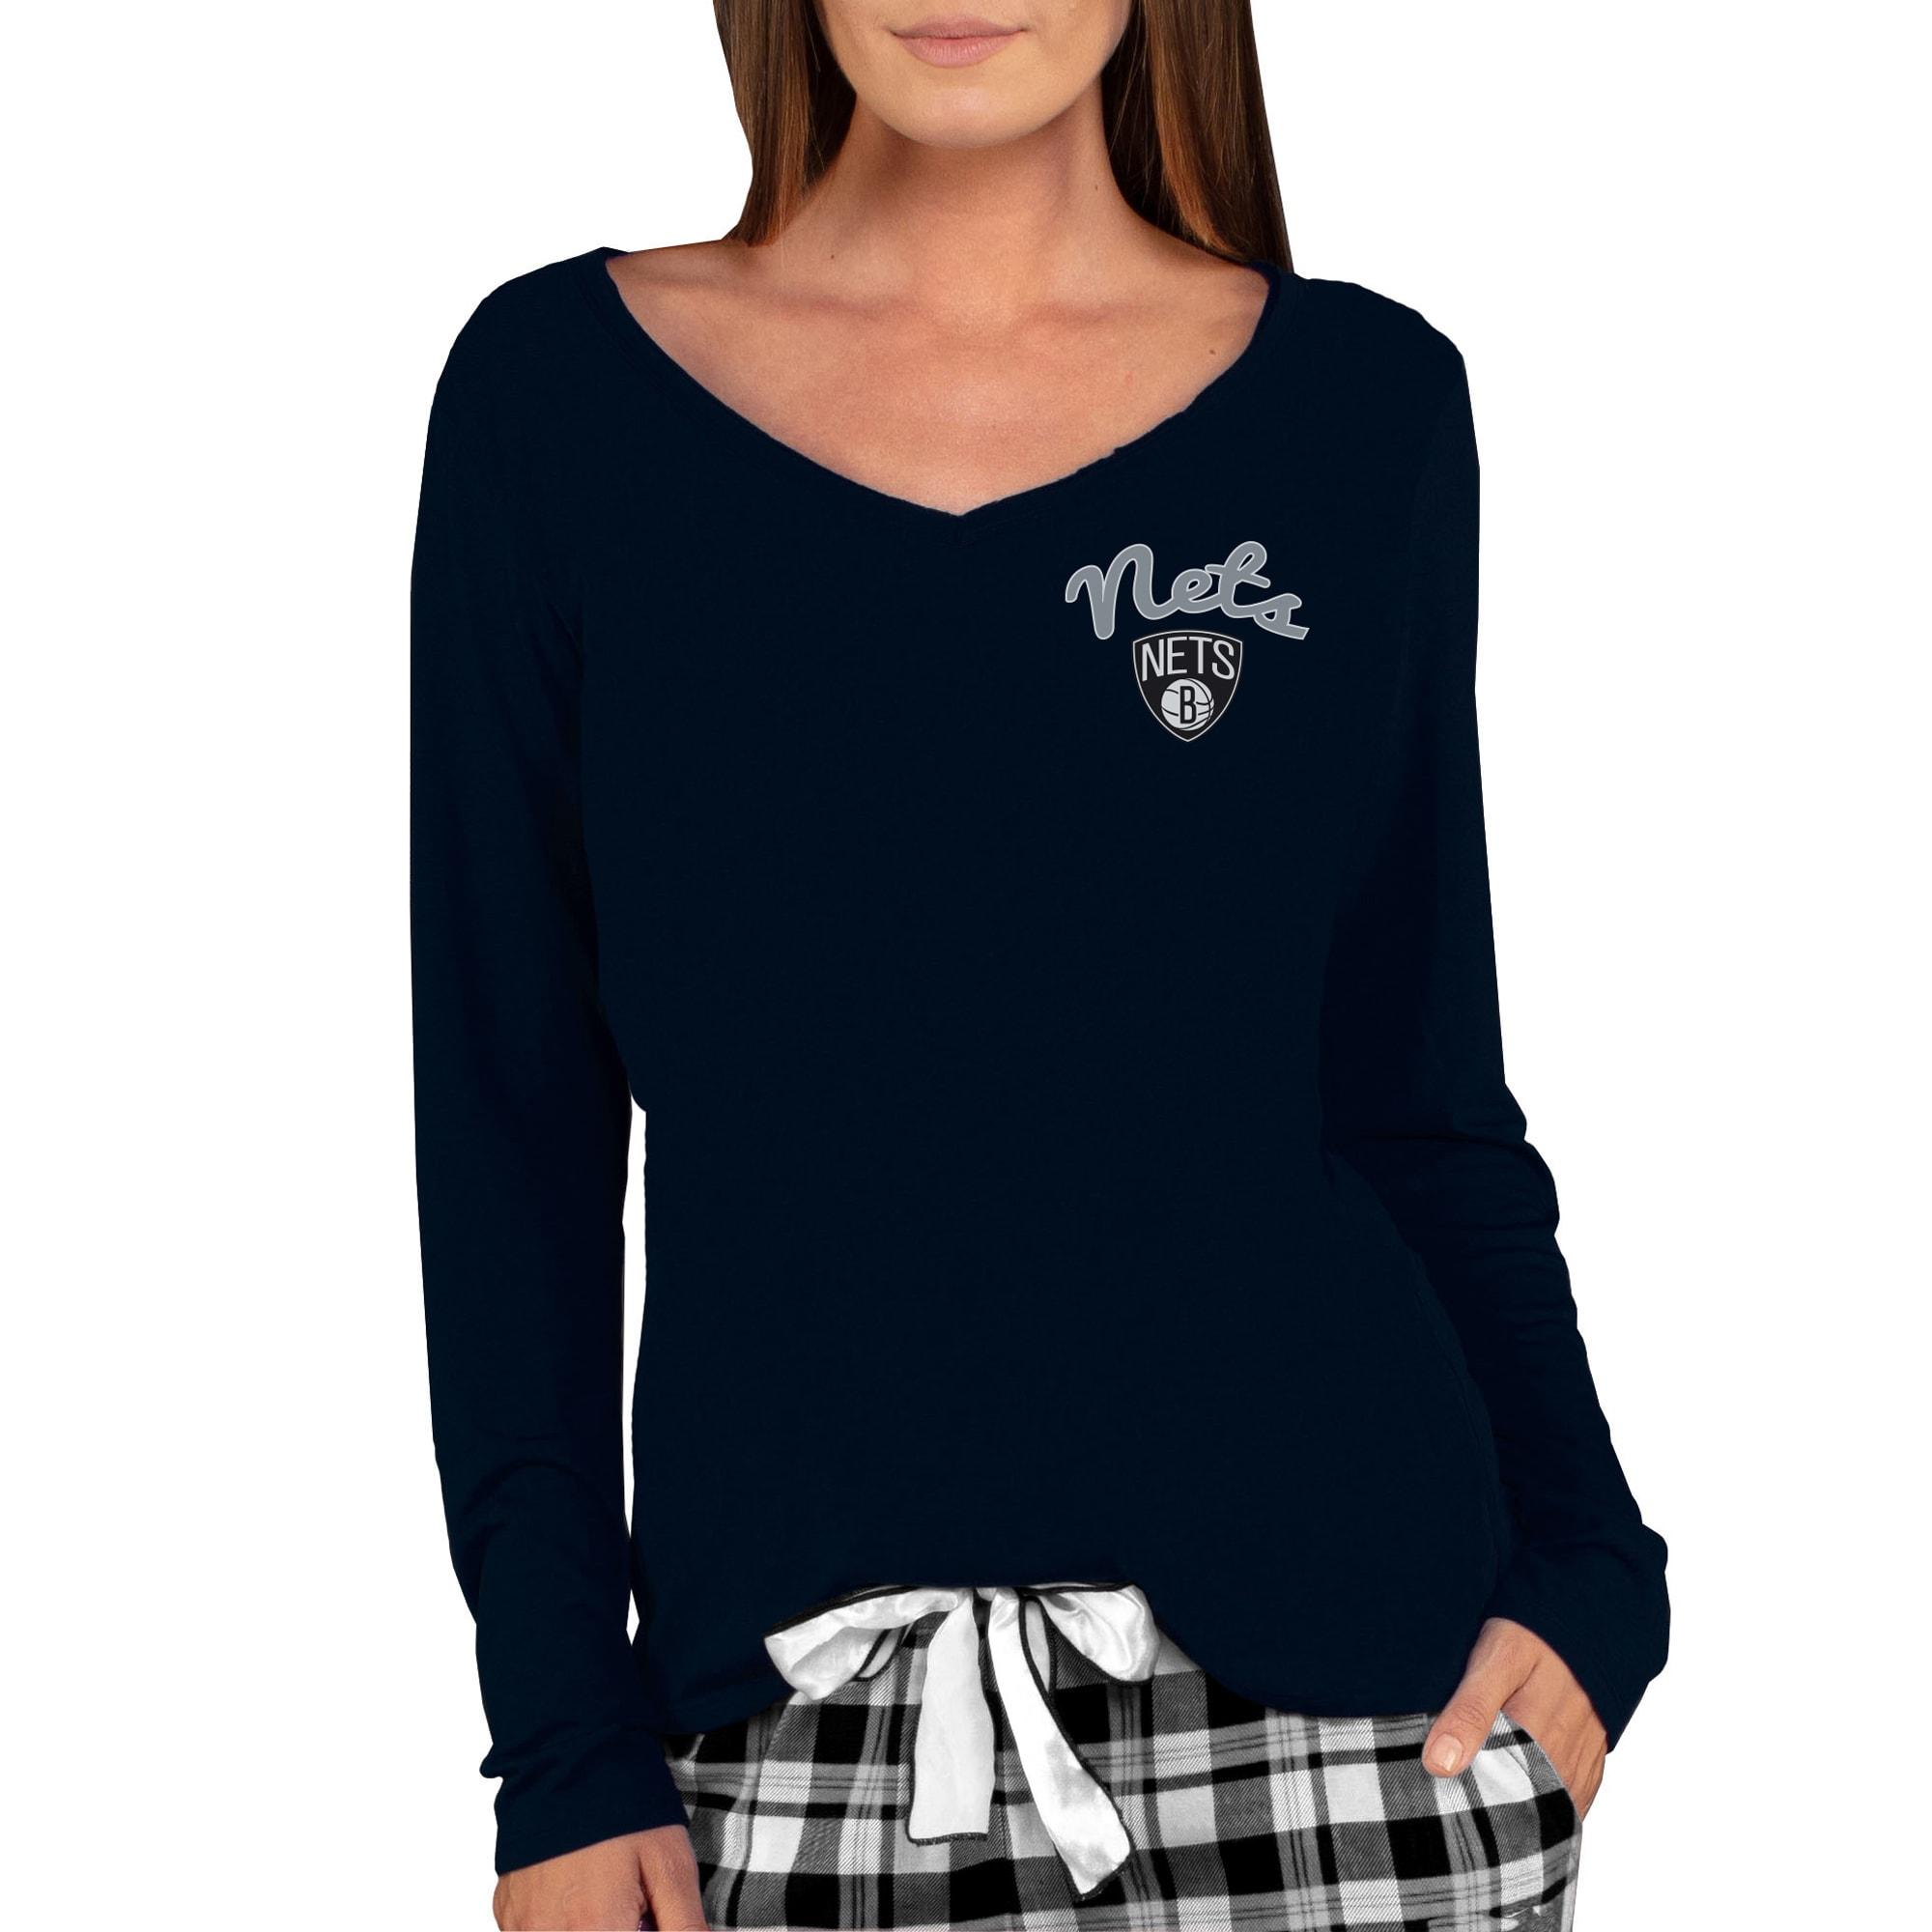 Brooklyn Nets Concepts Sport Women's Marathon V-Neck Long Sleeve T-Shirt - Black